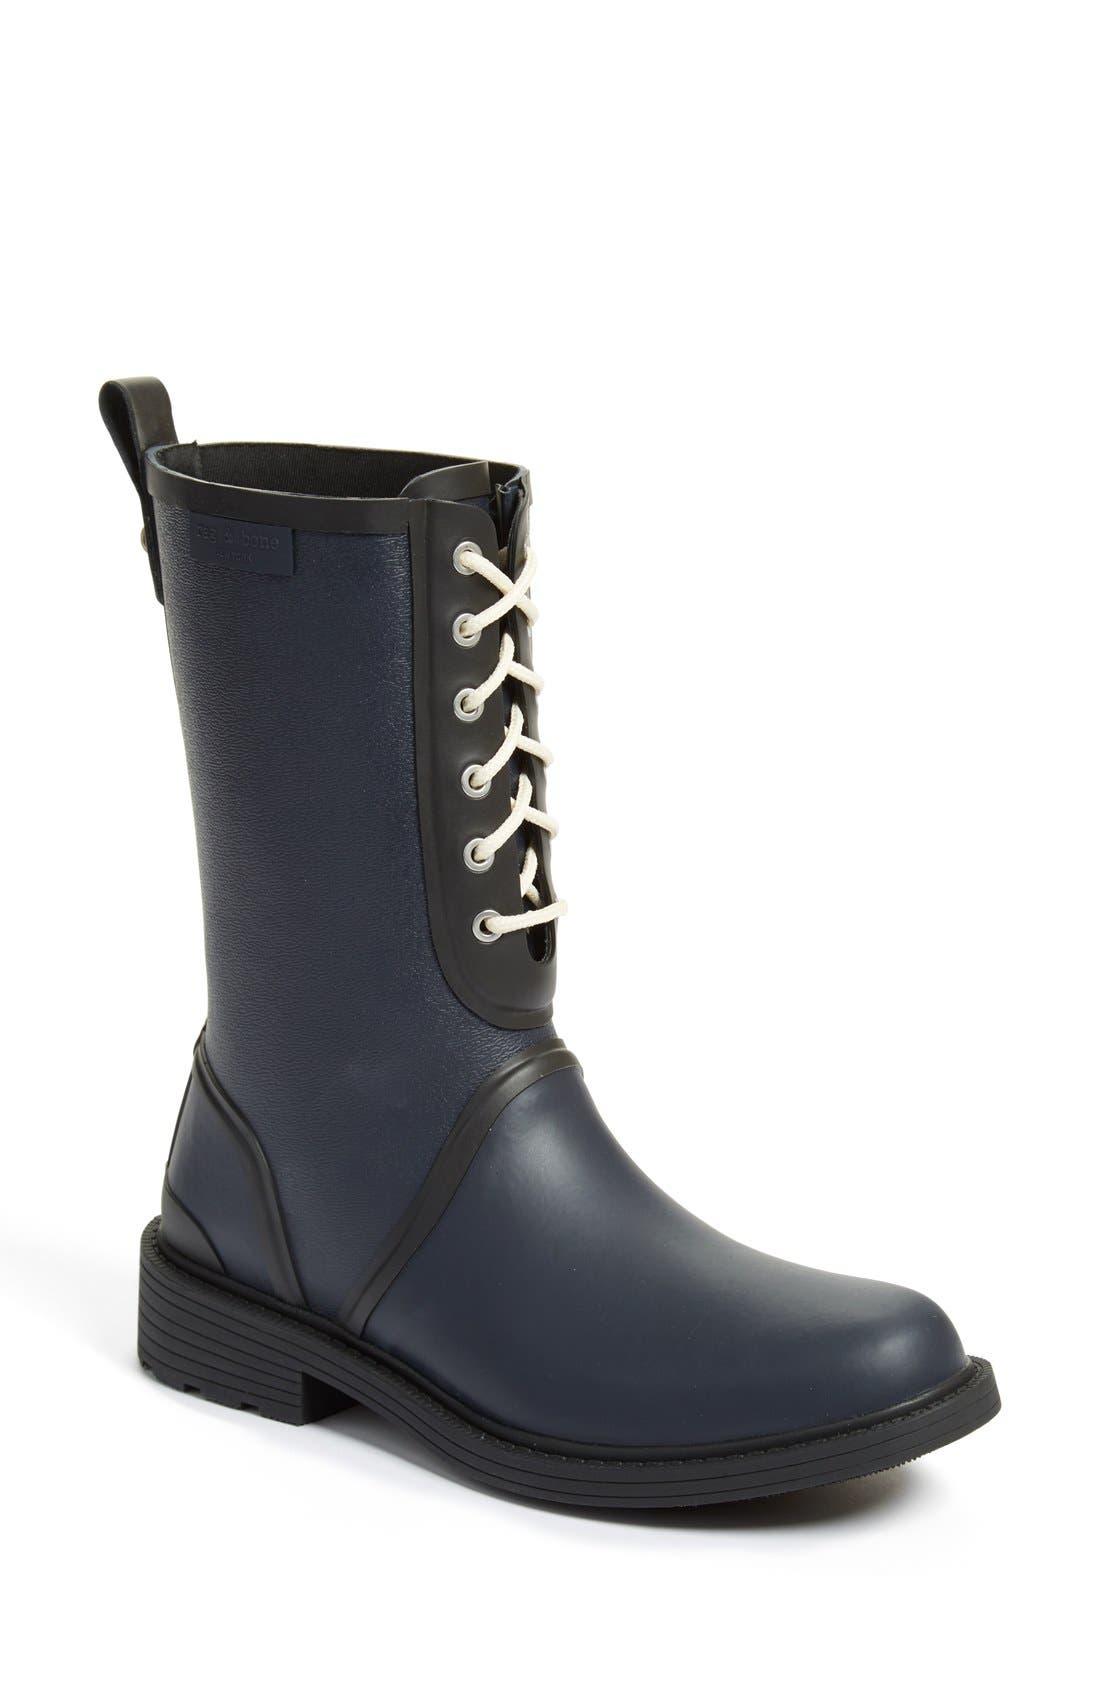 Main Image - rag & bone 'Ansel' Rain Boot (Women)